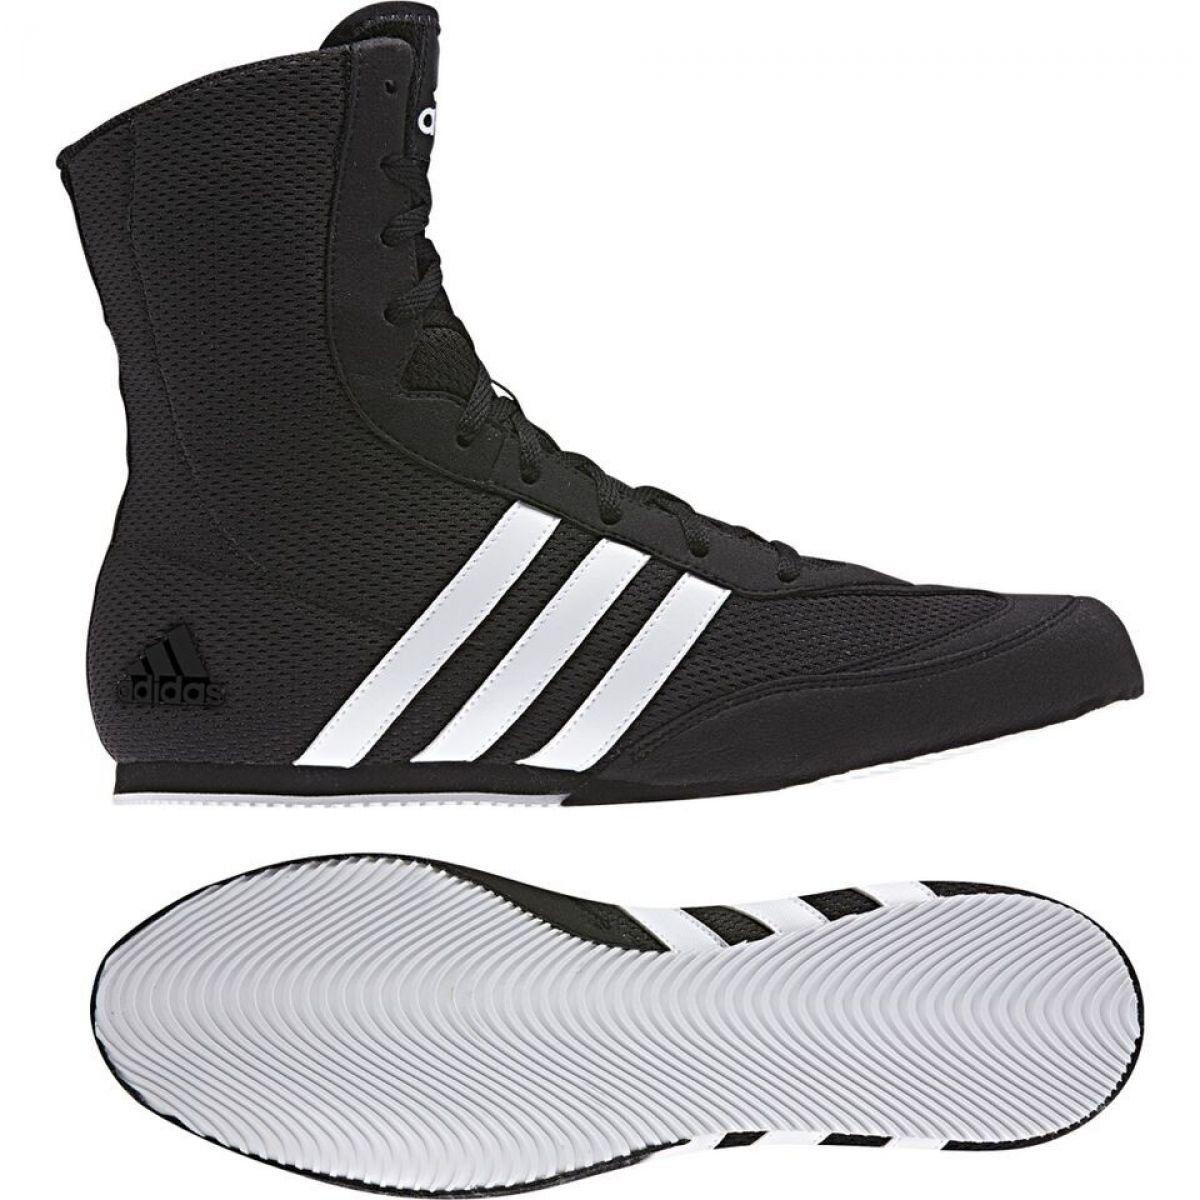 Sportowe Meskie Adidas Czarne Buty Bokserskie Adidas Box Hog Ii Boxing Boots Boxing Shoes Black Boots